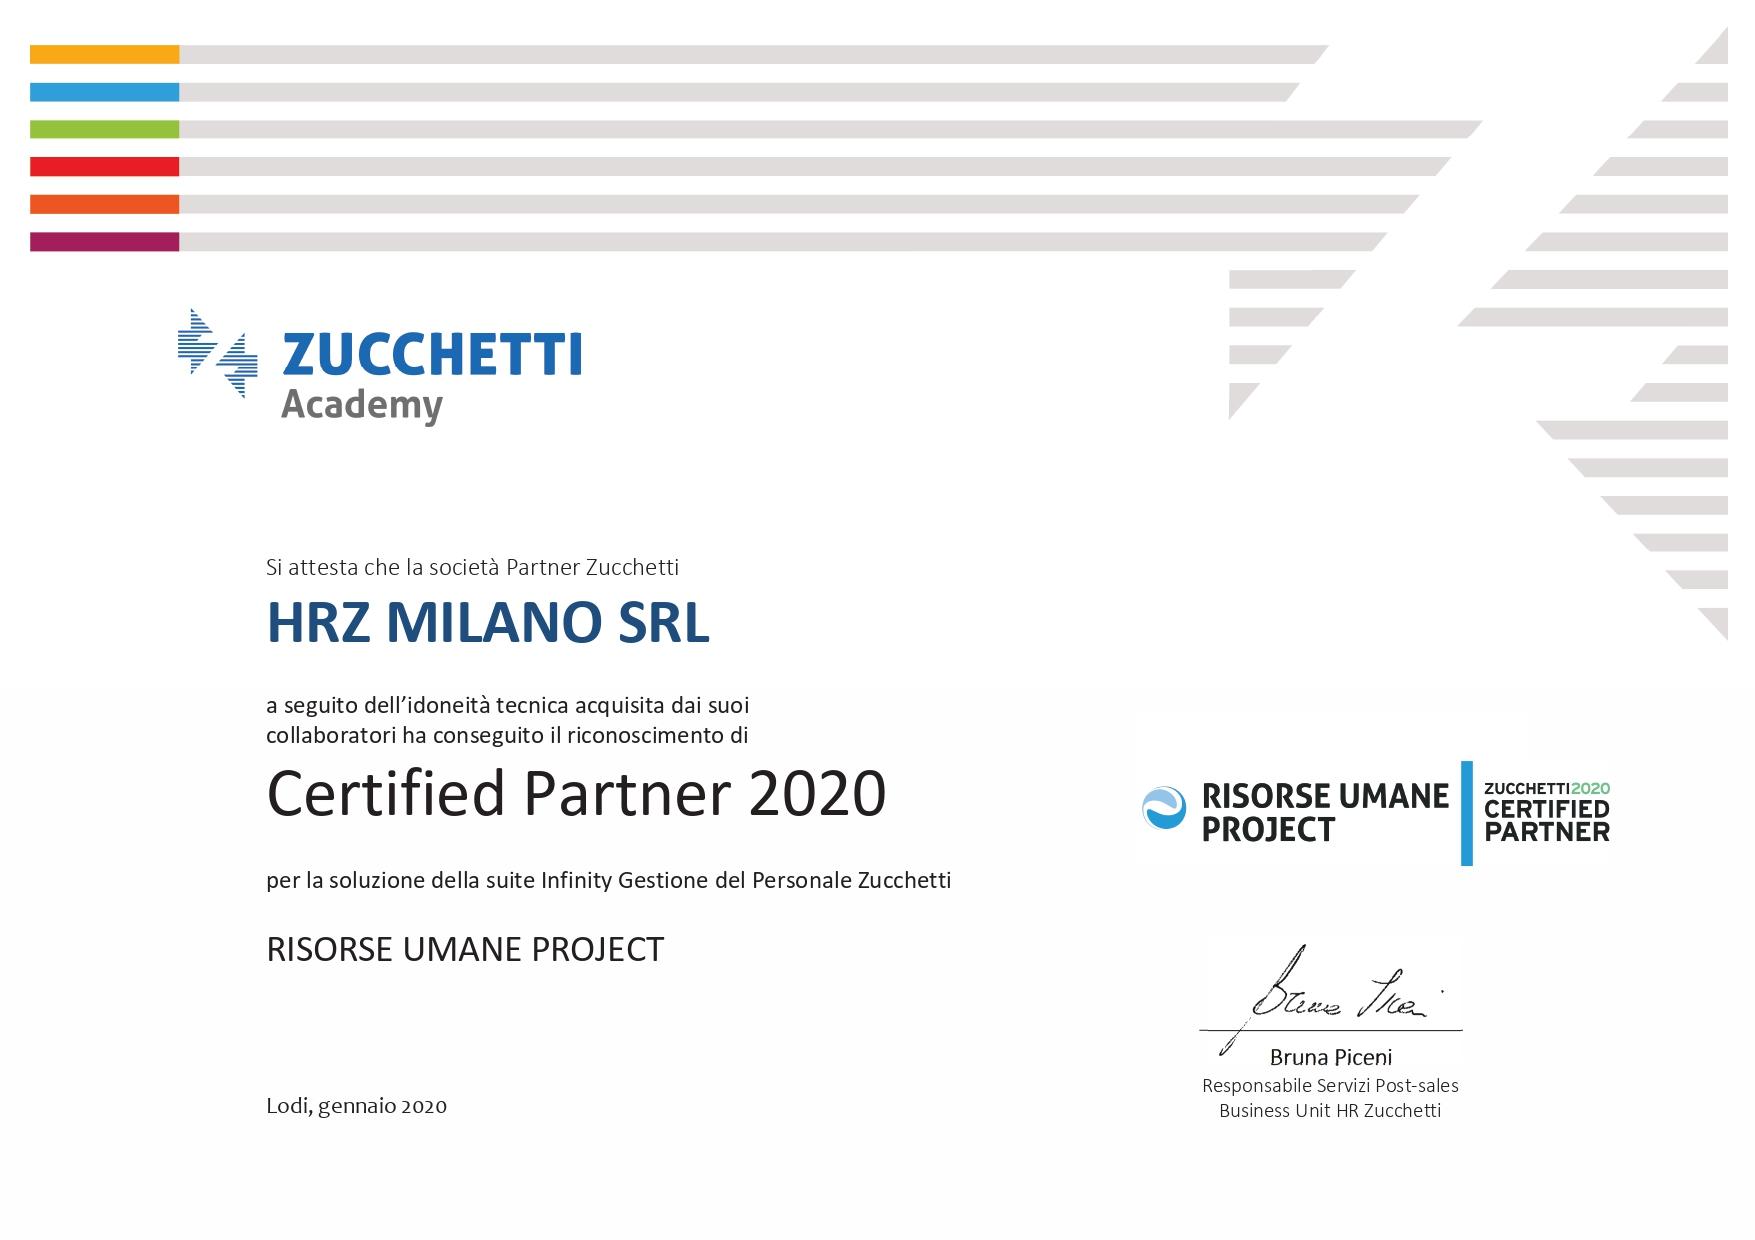 Risorse Umane Project